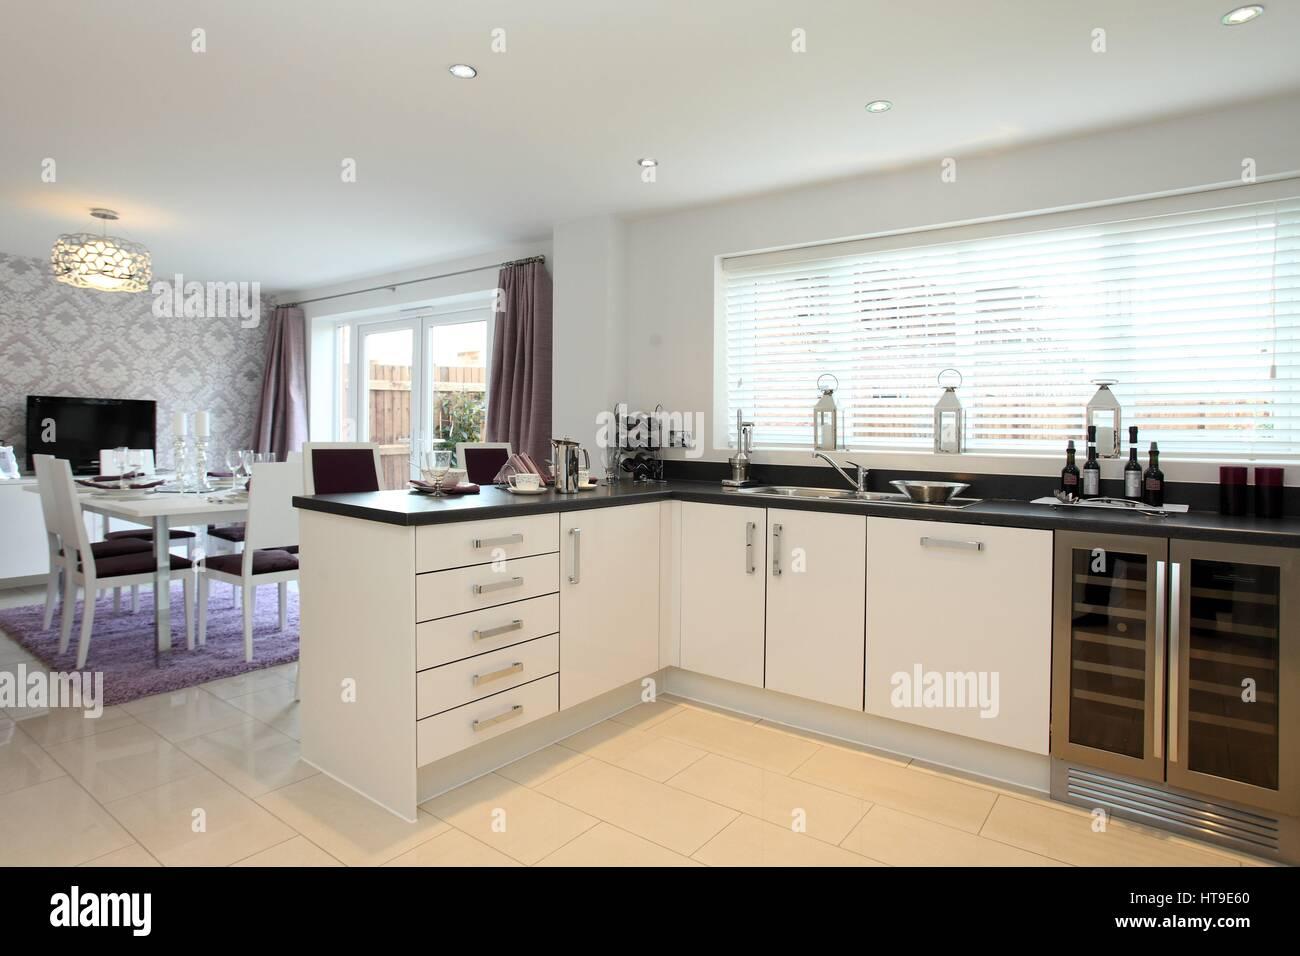 Home Interior Modern Kitchen Diner New Build Home Kitchen In White Stock Photo Alamy